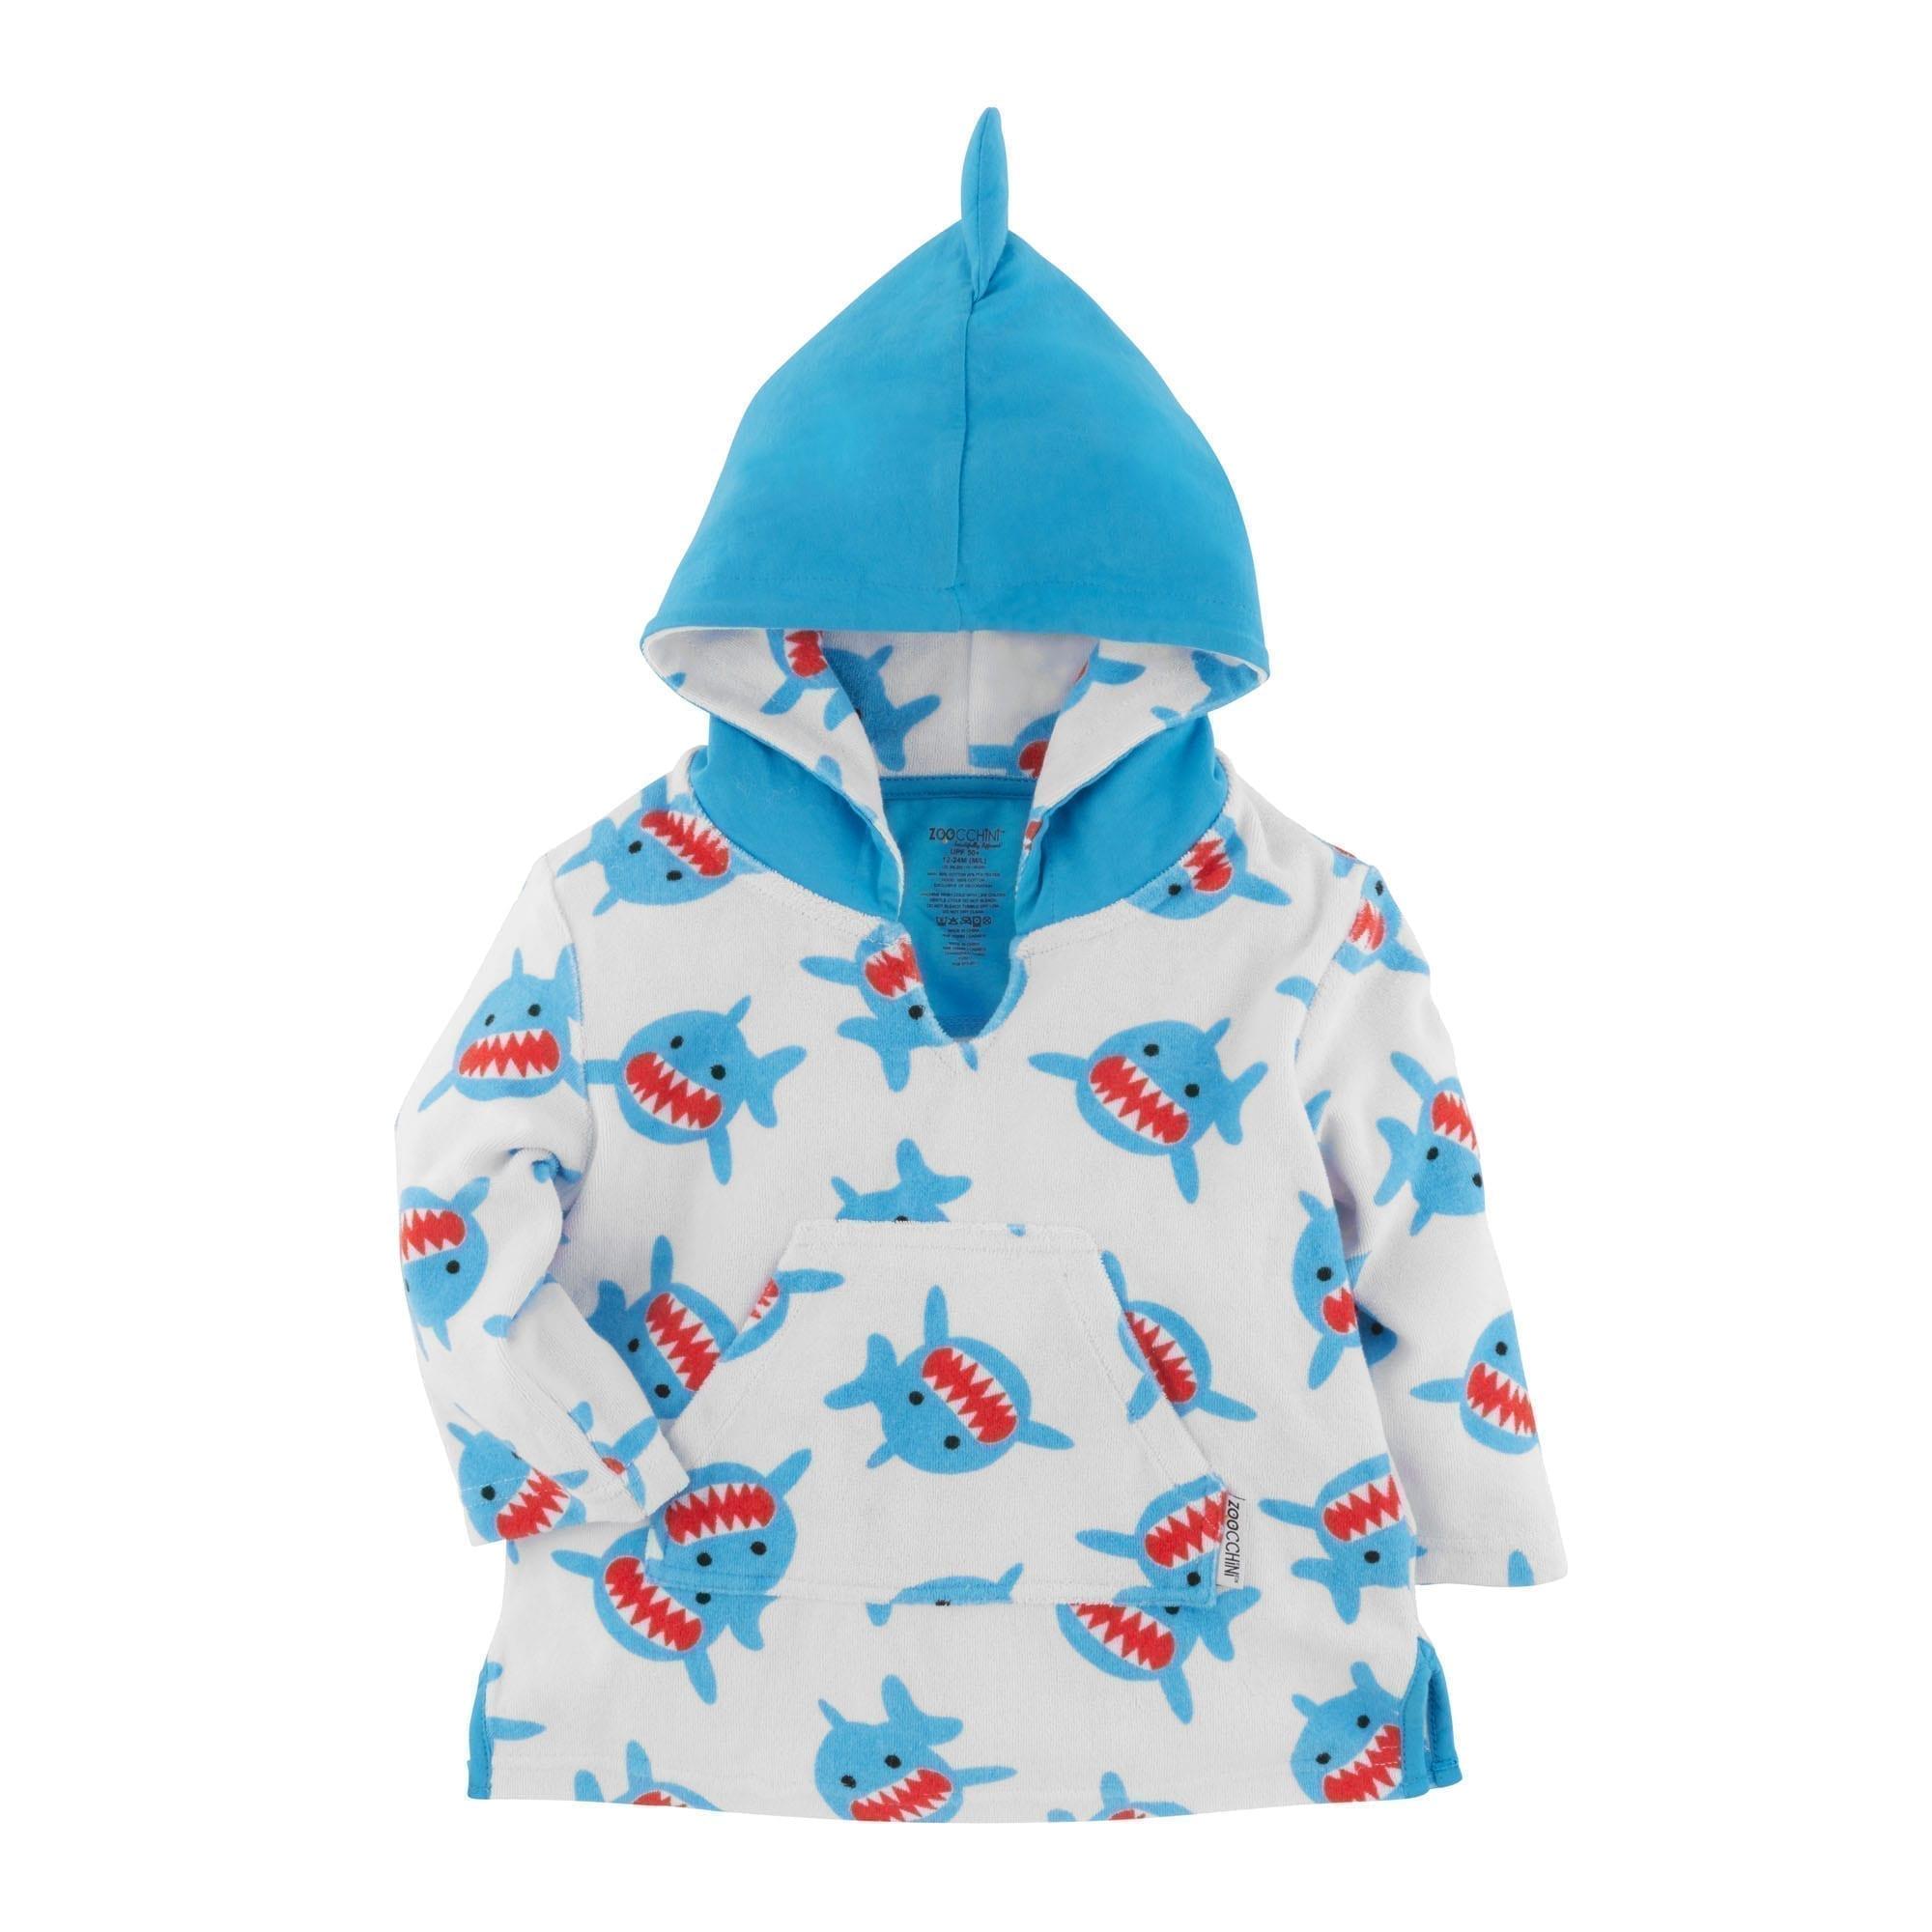 Zoocchini Hooded Towel Shark